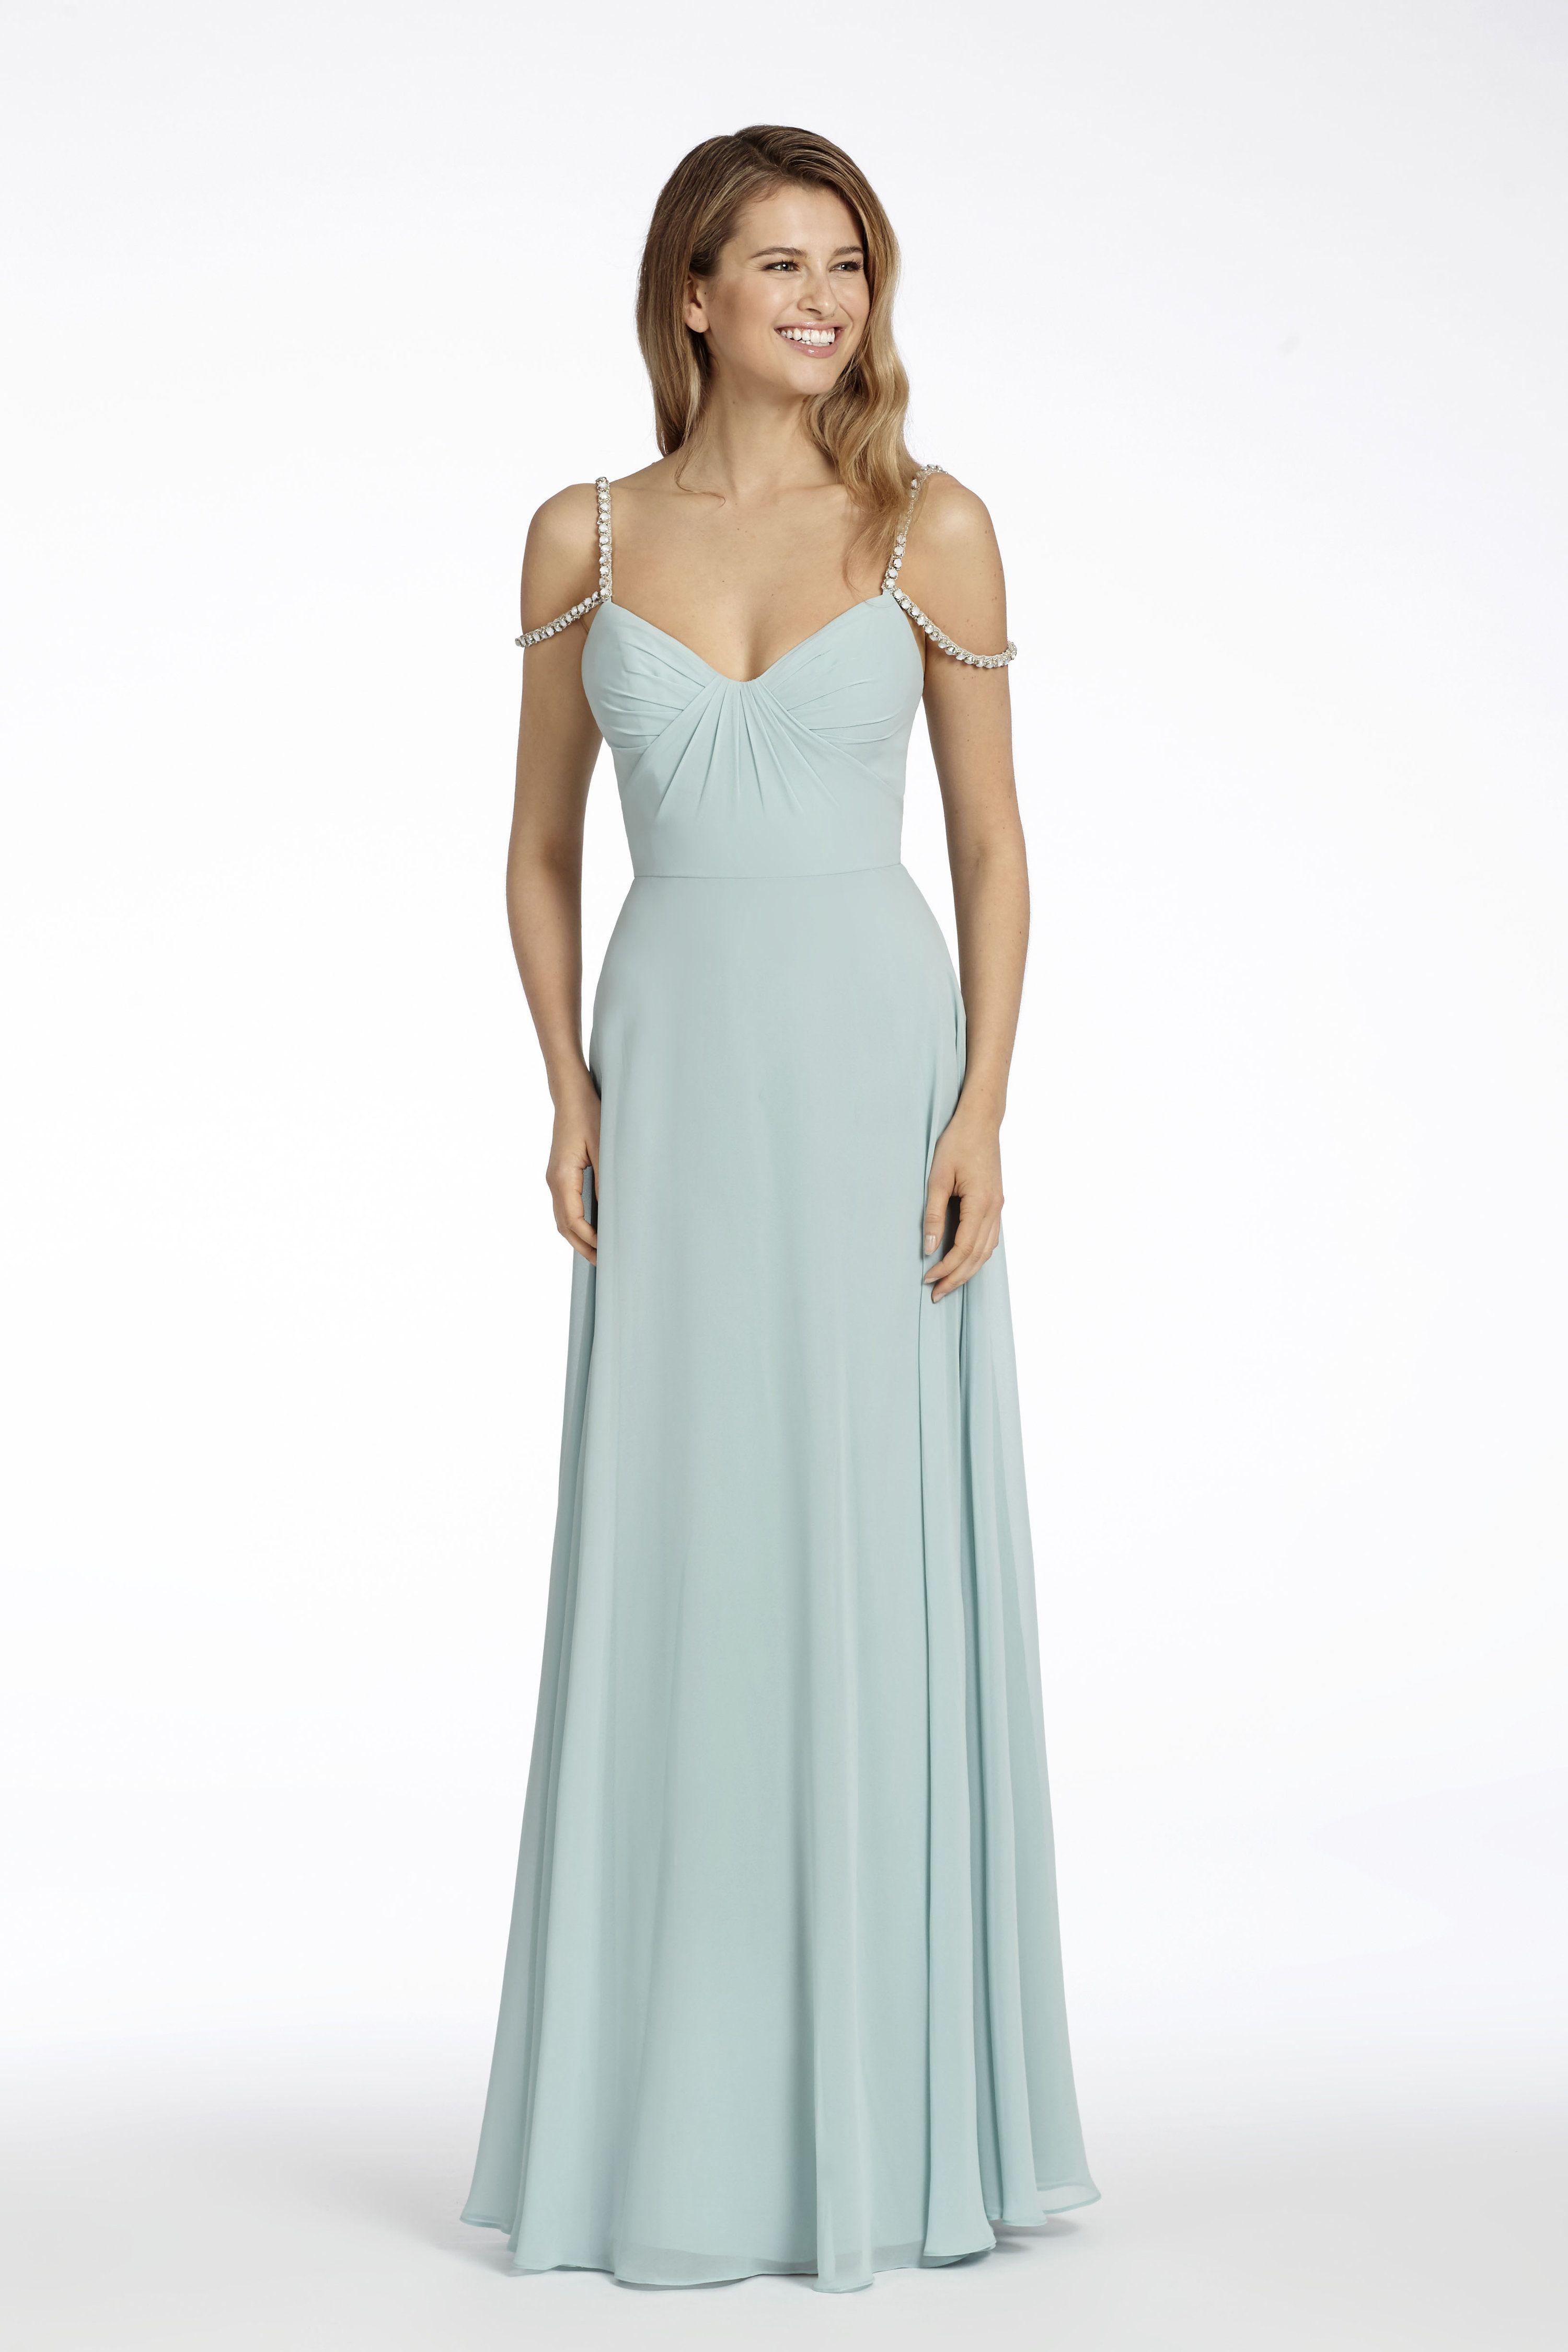 Style 5700 Lookbook Front | THE Dress & Company | Pinterest | Abendkleid